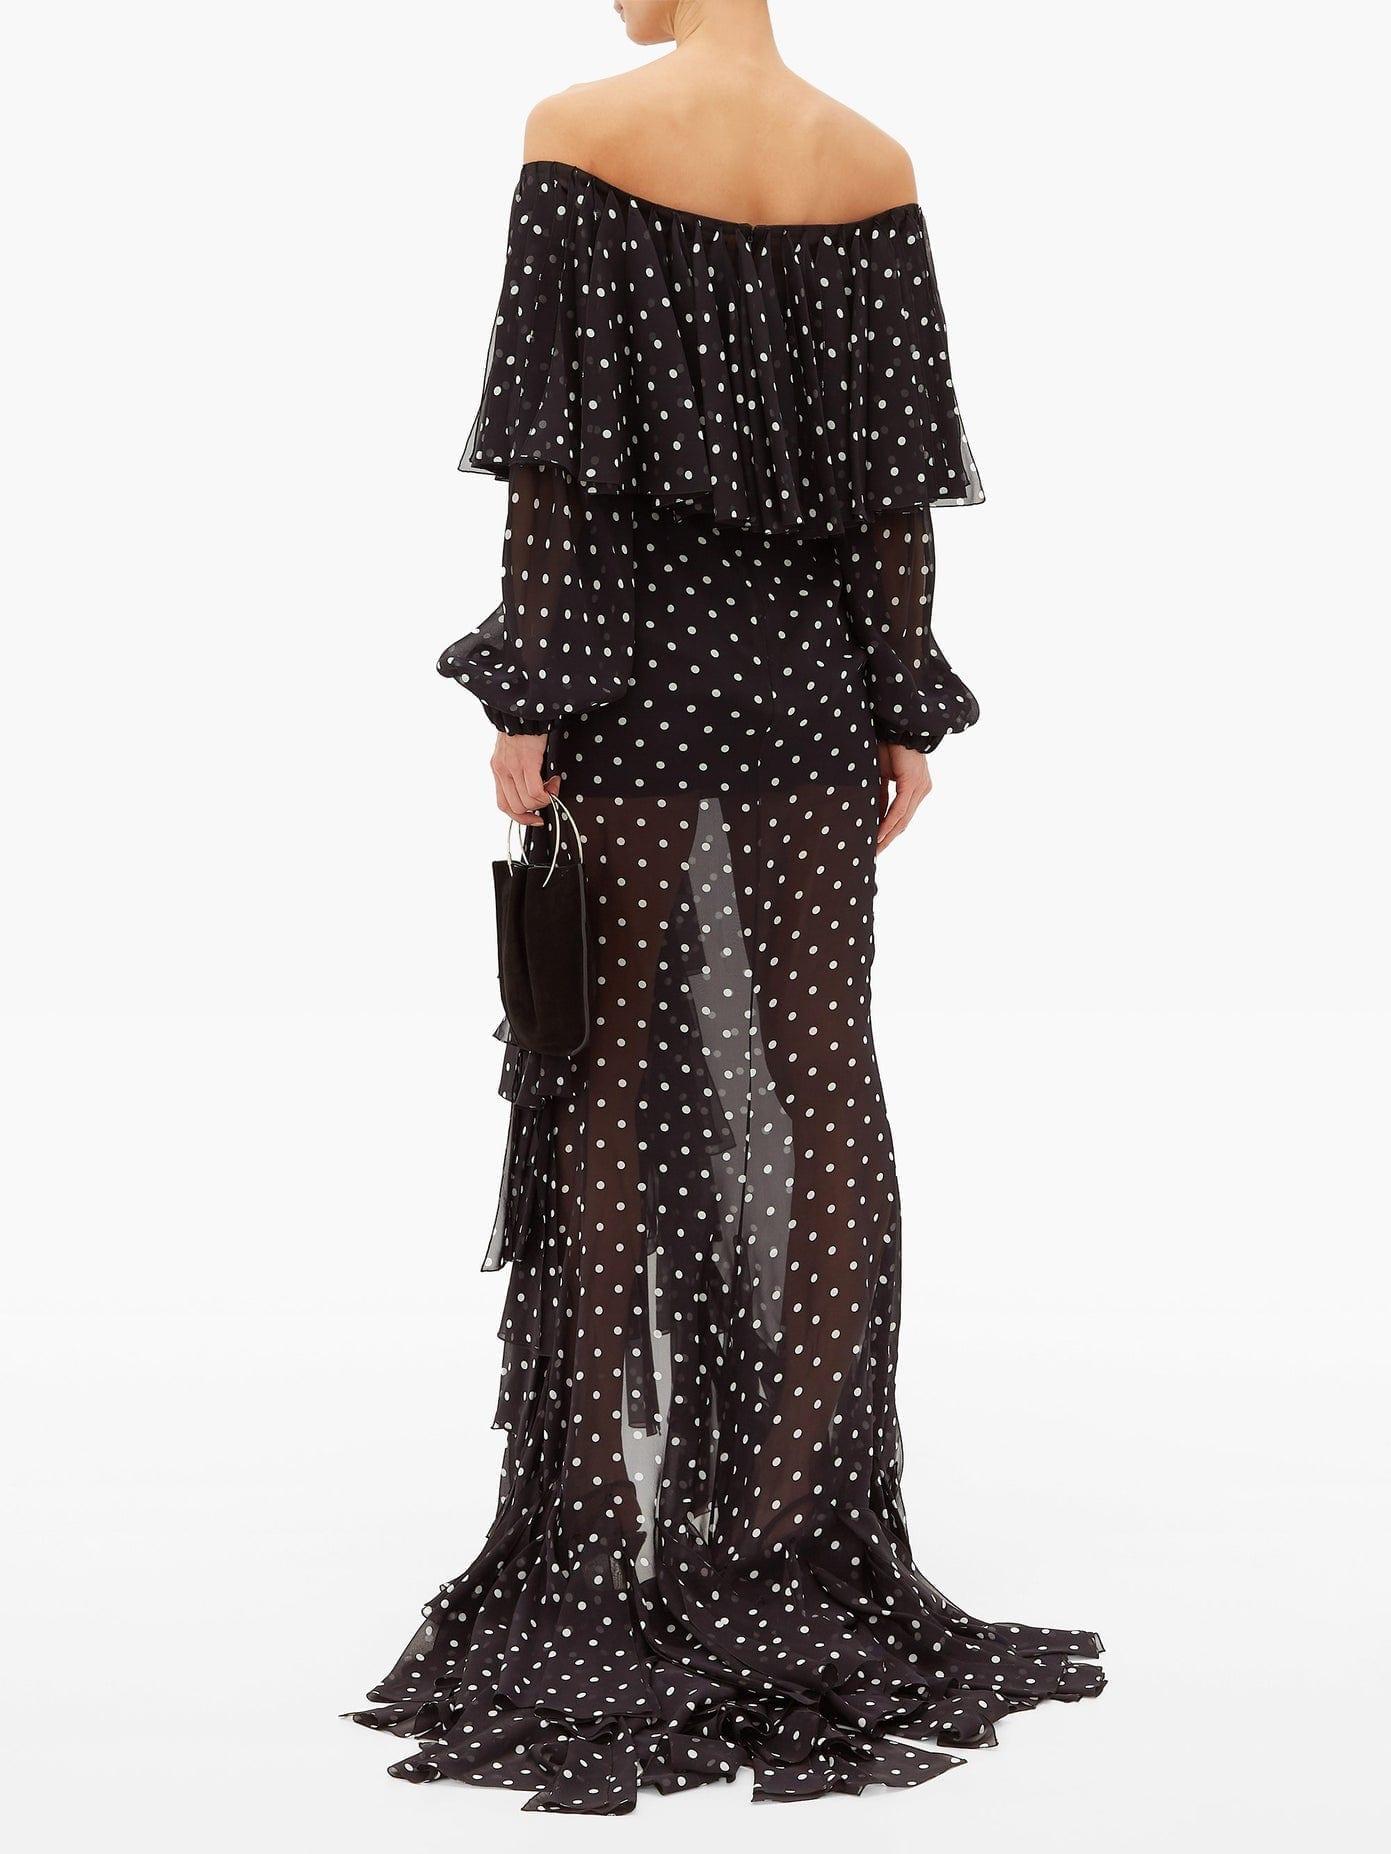 BALMAIN Polka-dot Off-the-shoulder Ruffled Silk Dress